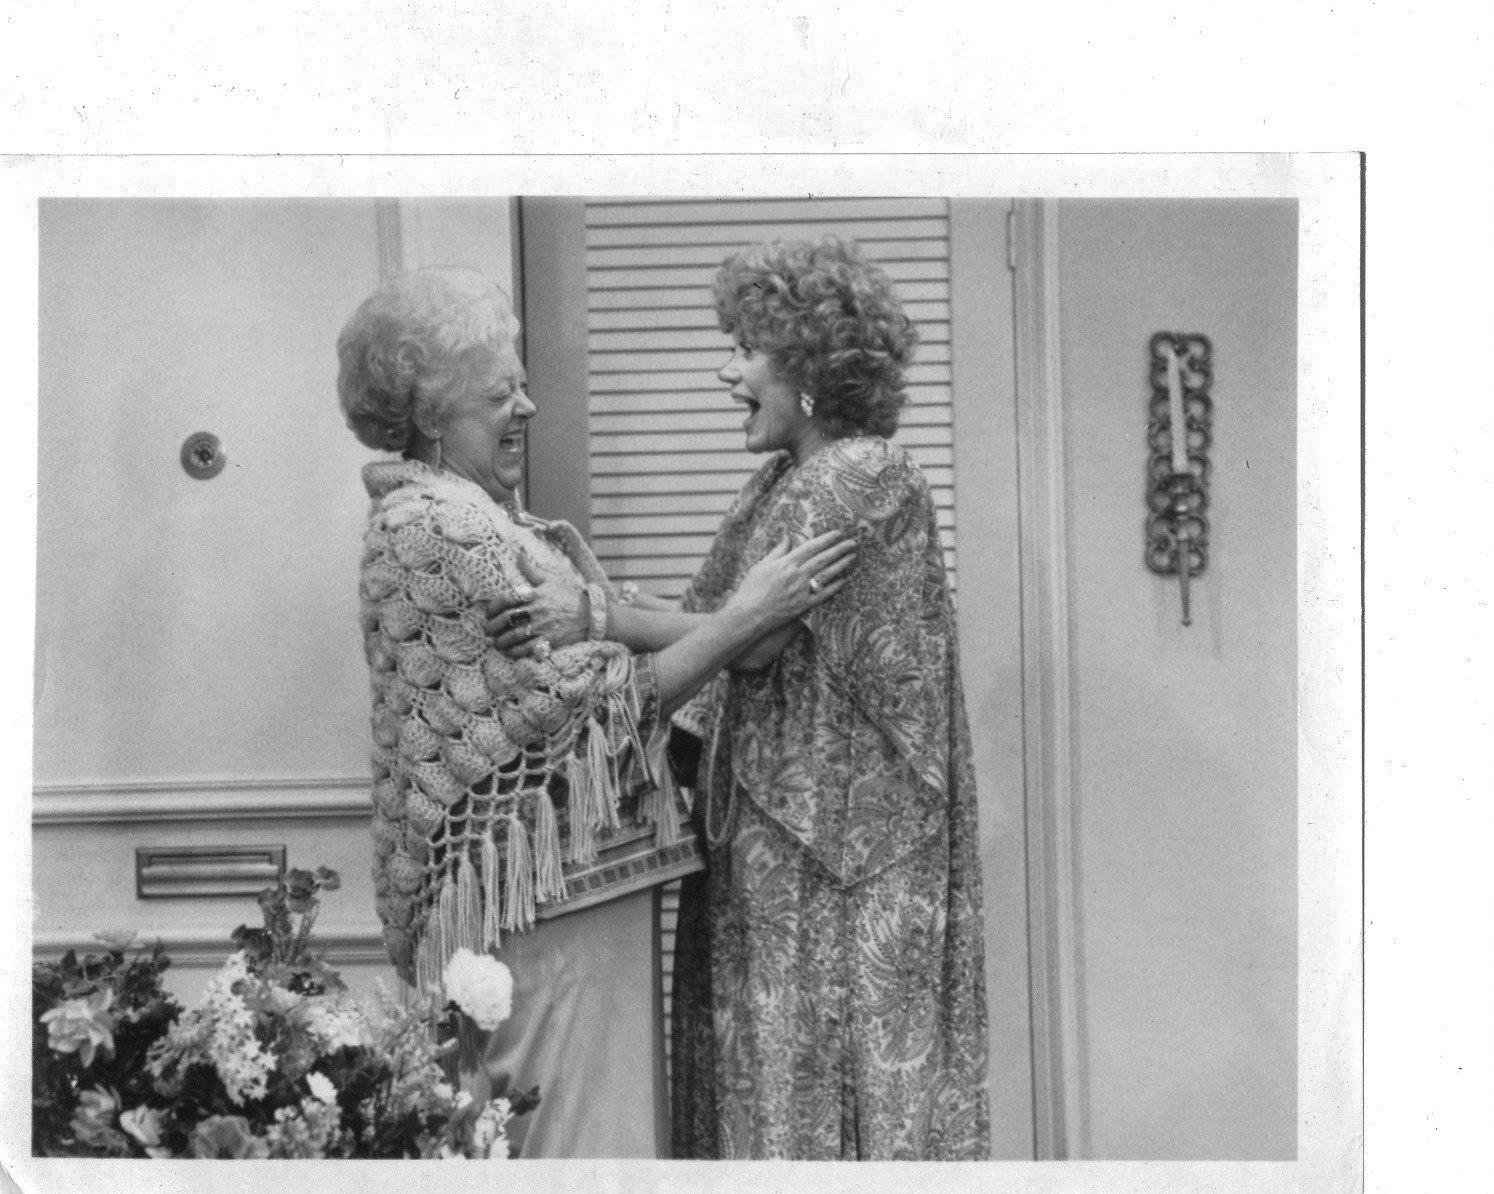 Lara Flynn Boyle,Lucie Trmikova XXX tube Yukie Kawamura (b. 1986),Betty McDowall